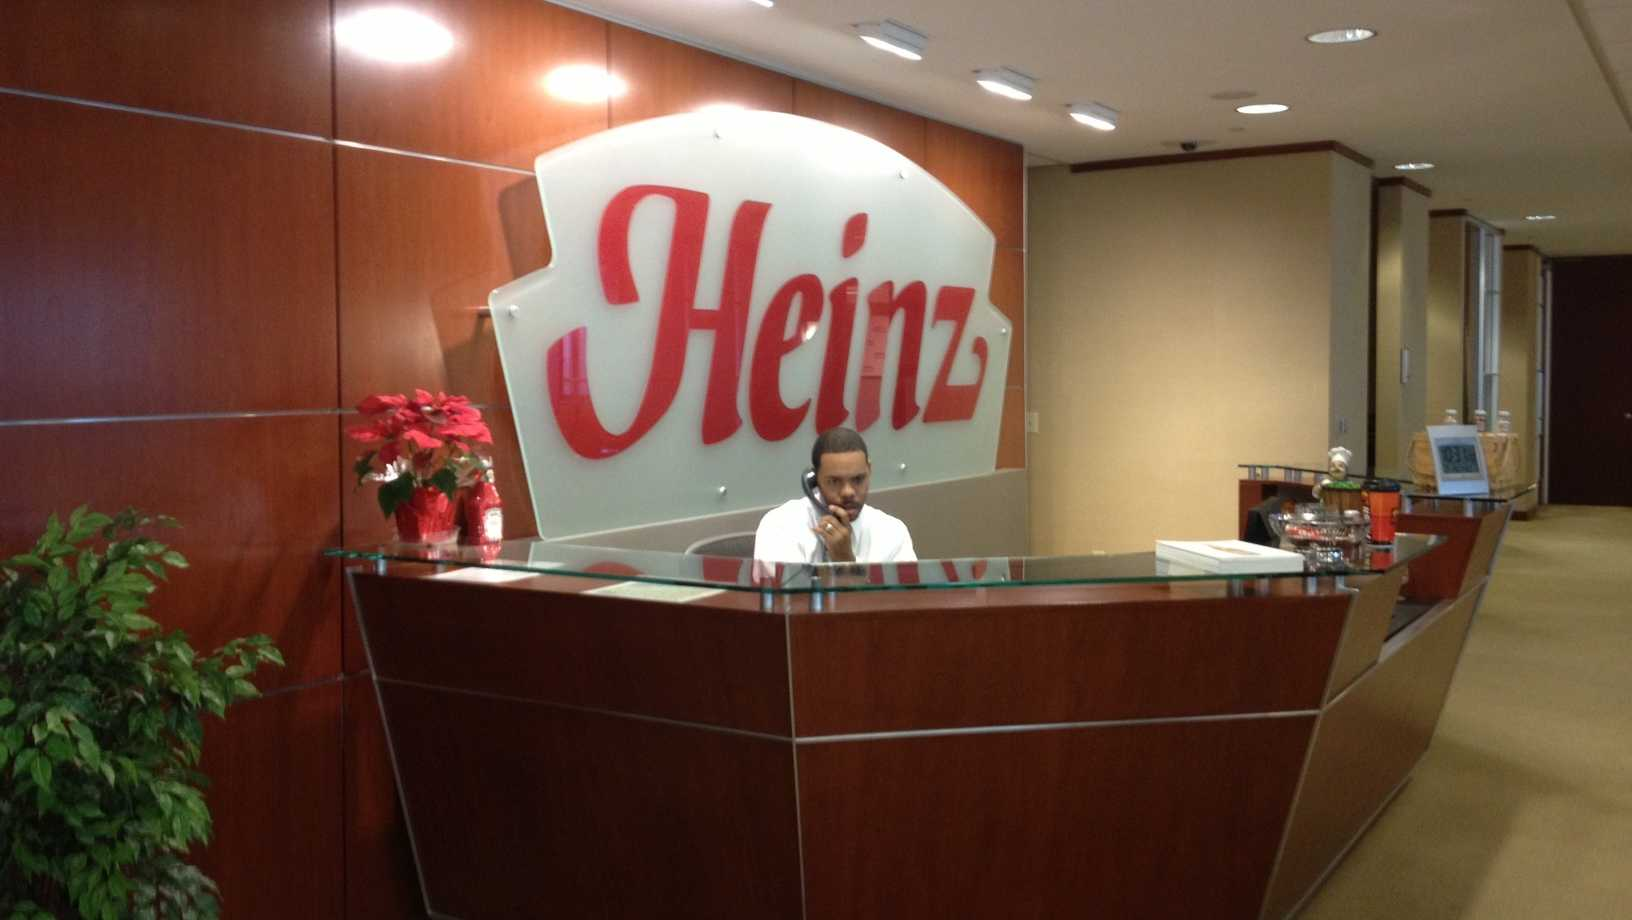 Kraft Heinz headquarters